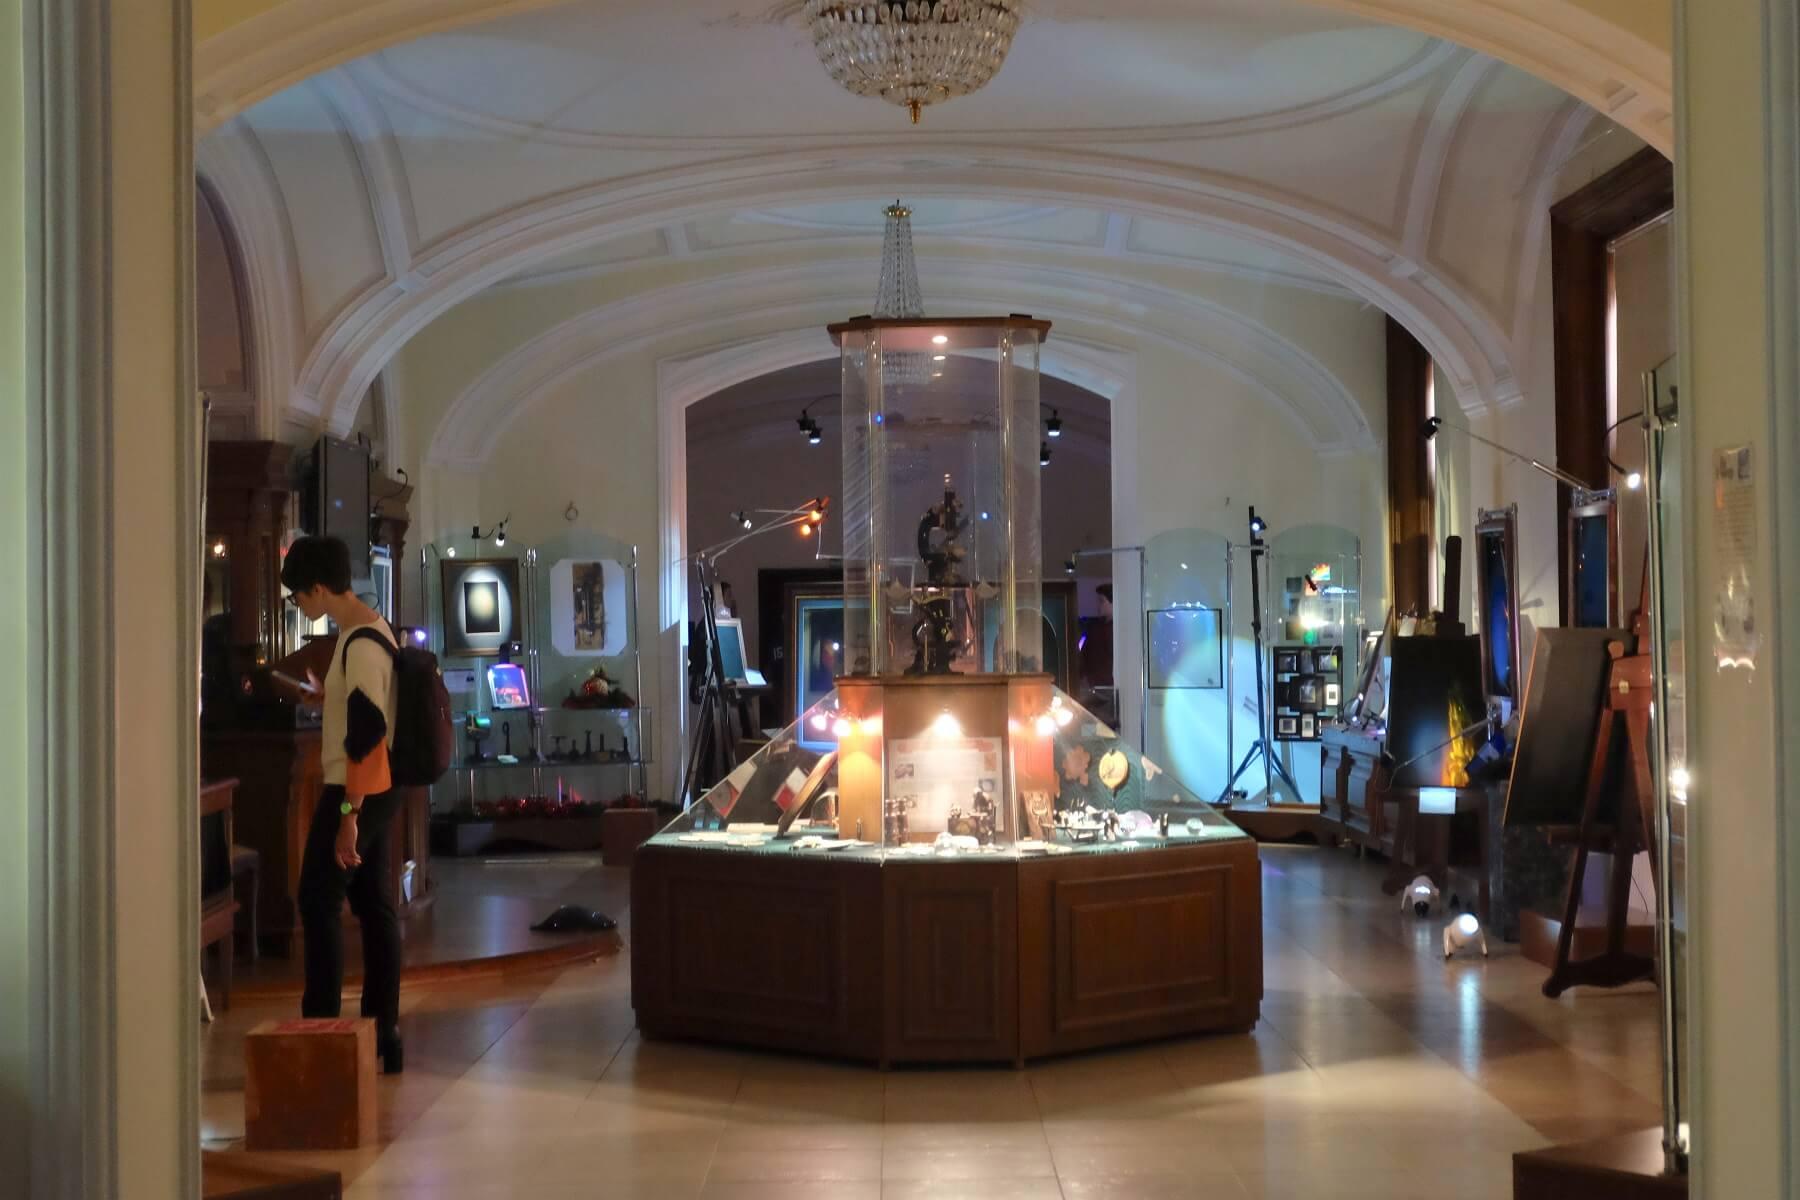 Фотоэкскурсия: Музей оптики Университета ИТМО - 12